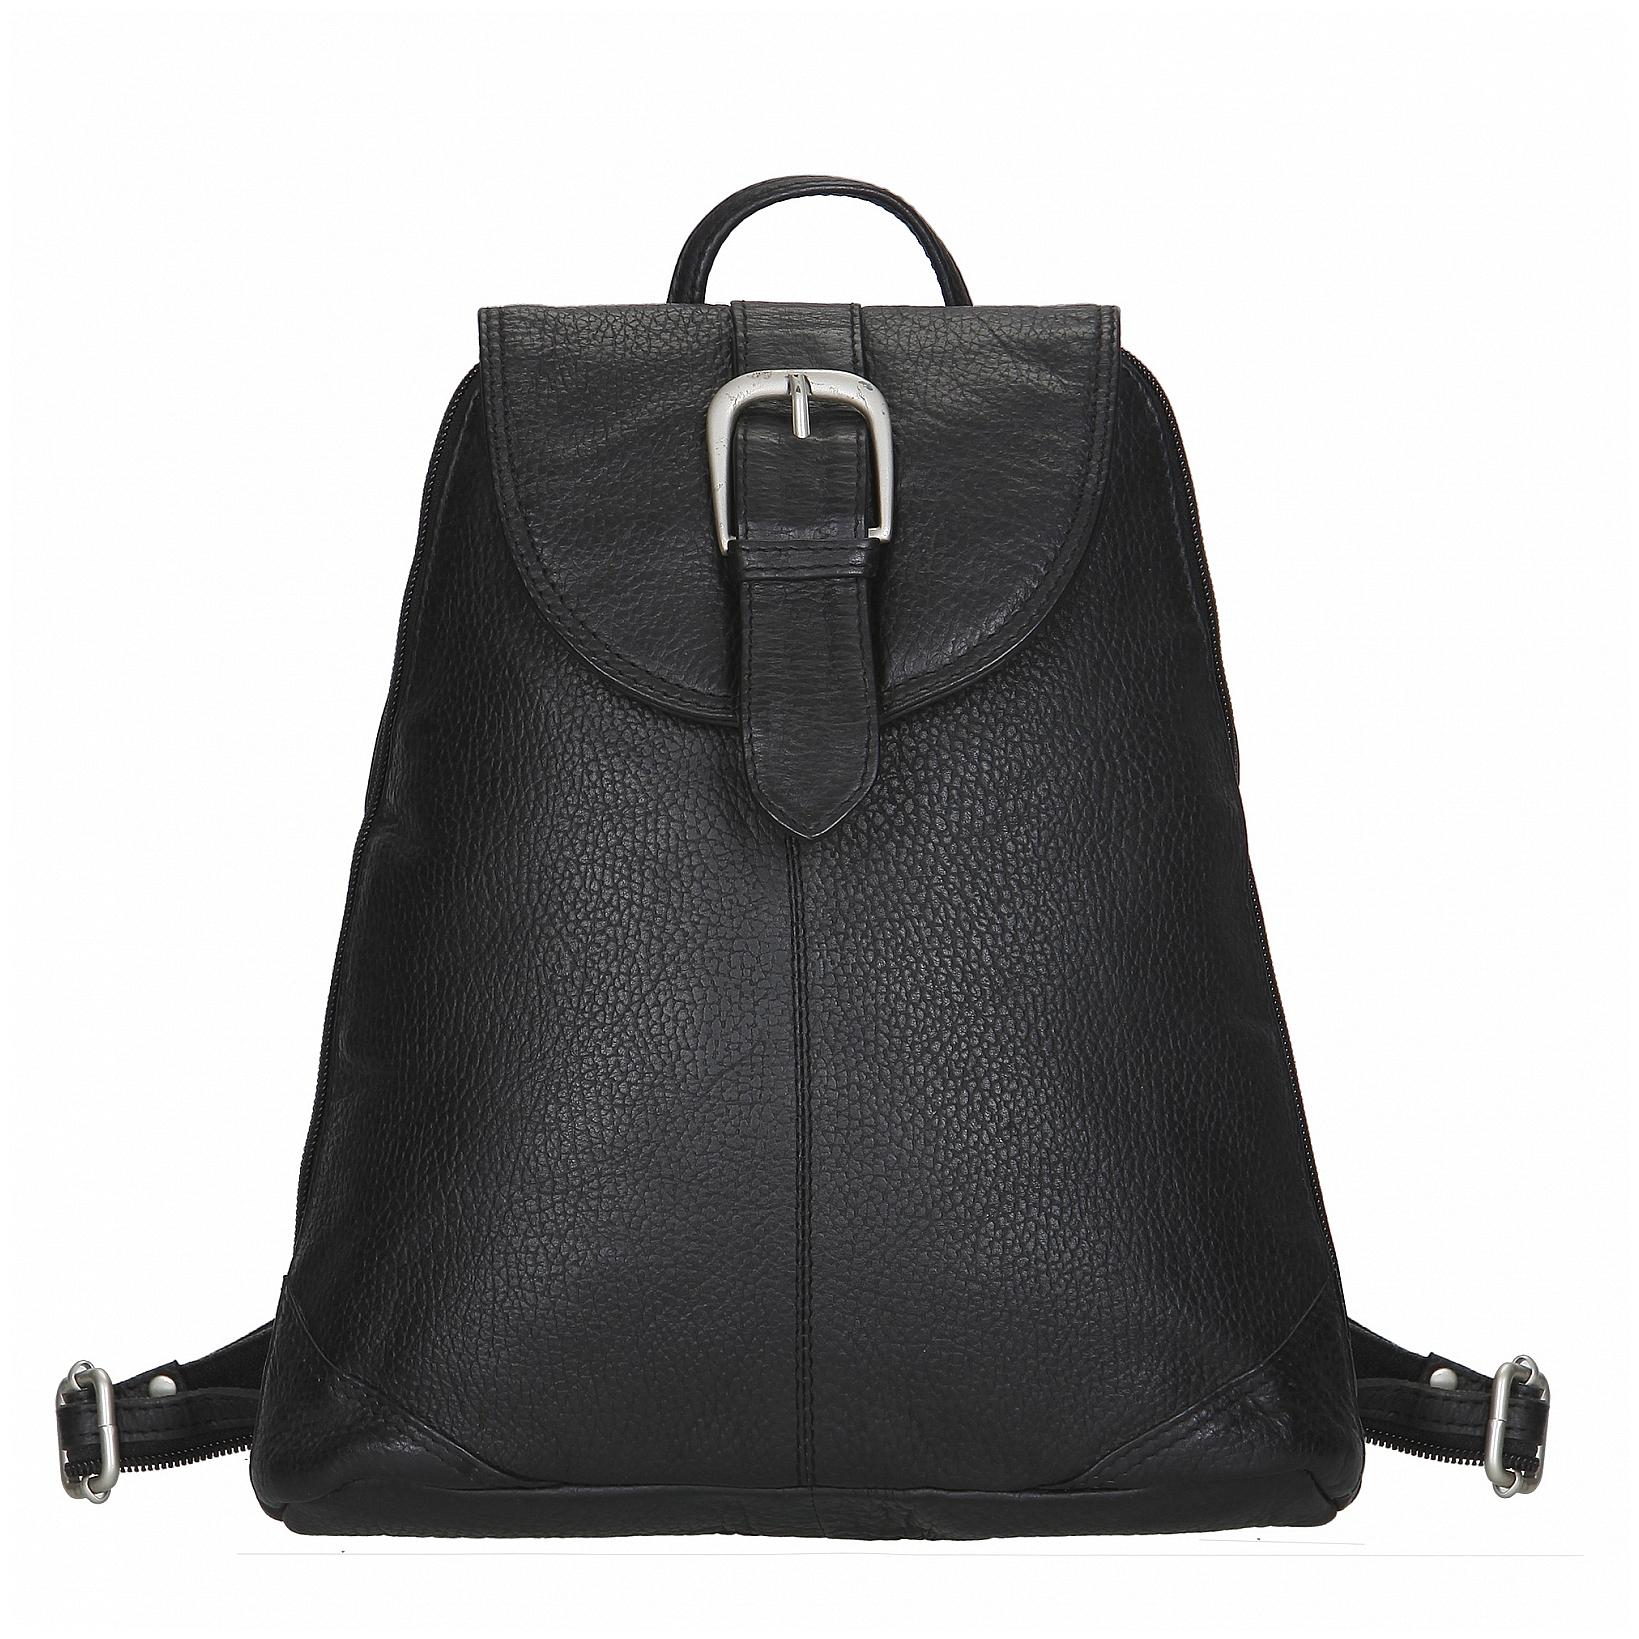 ESTELLE Dámský kožený batoh 1273 černý